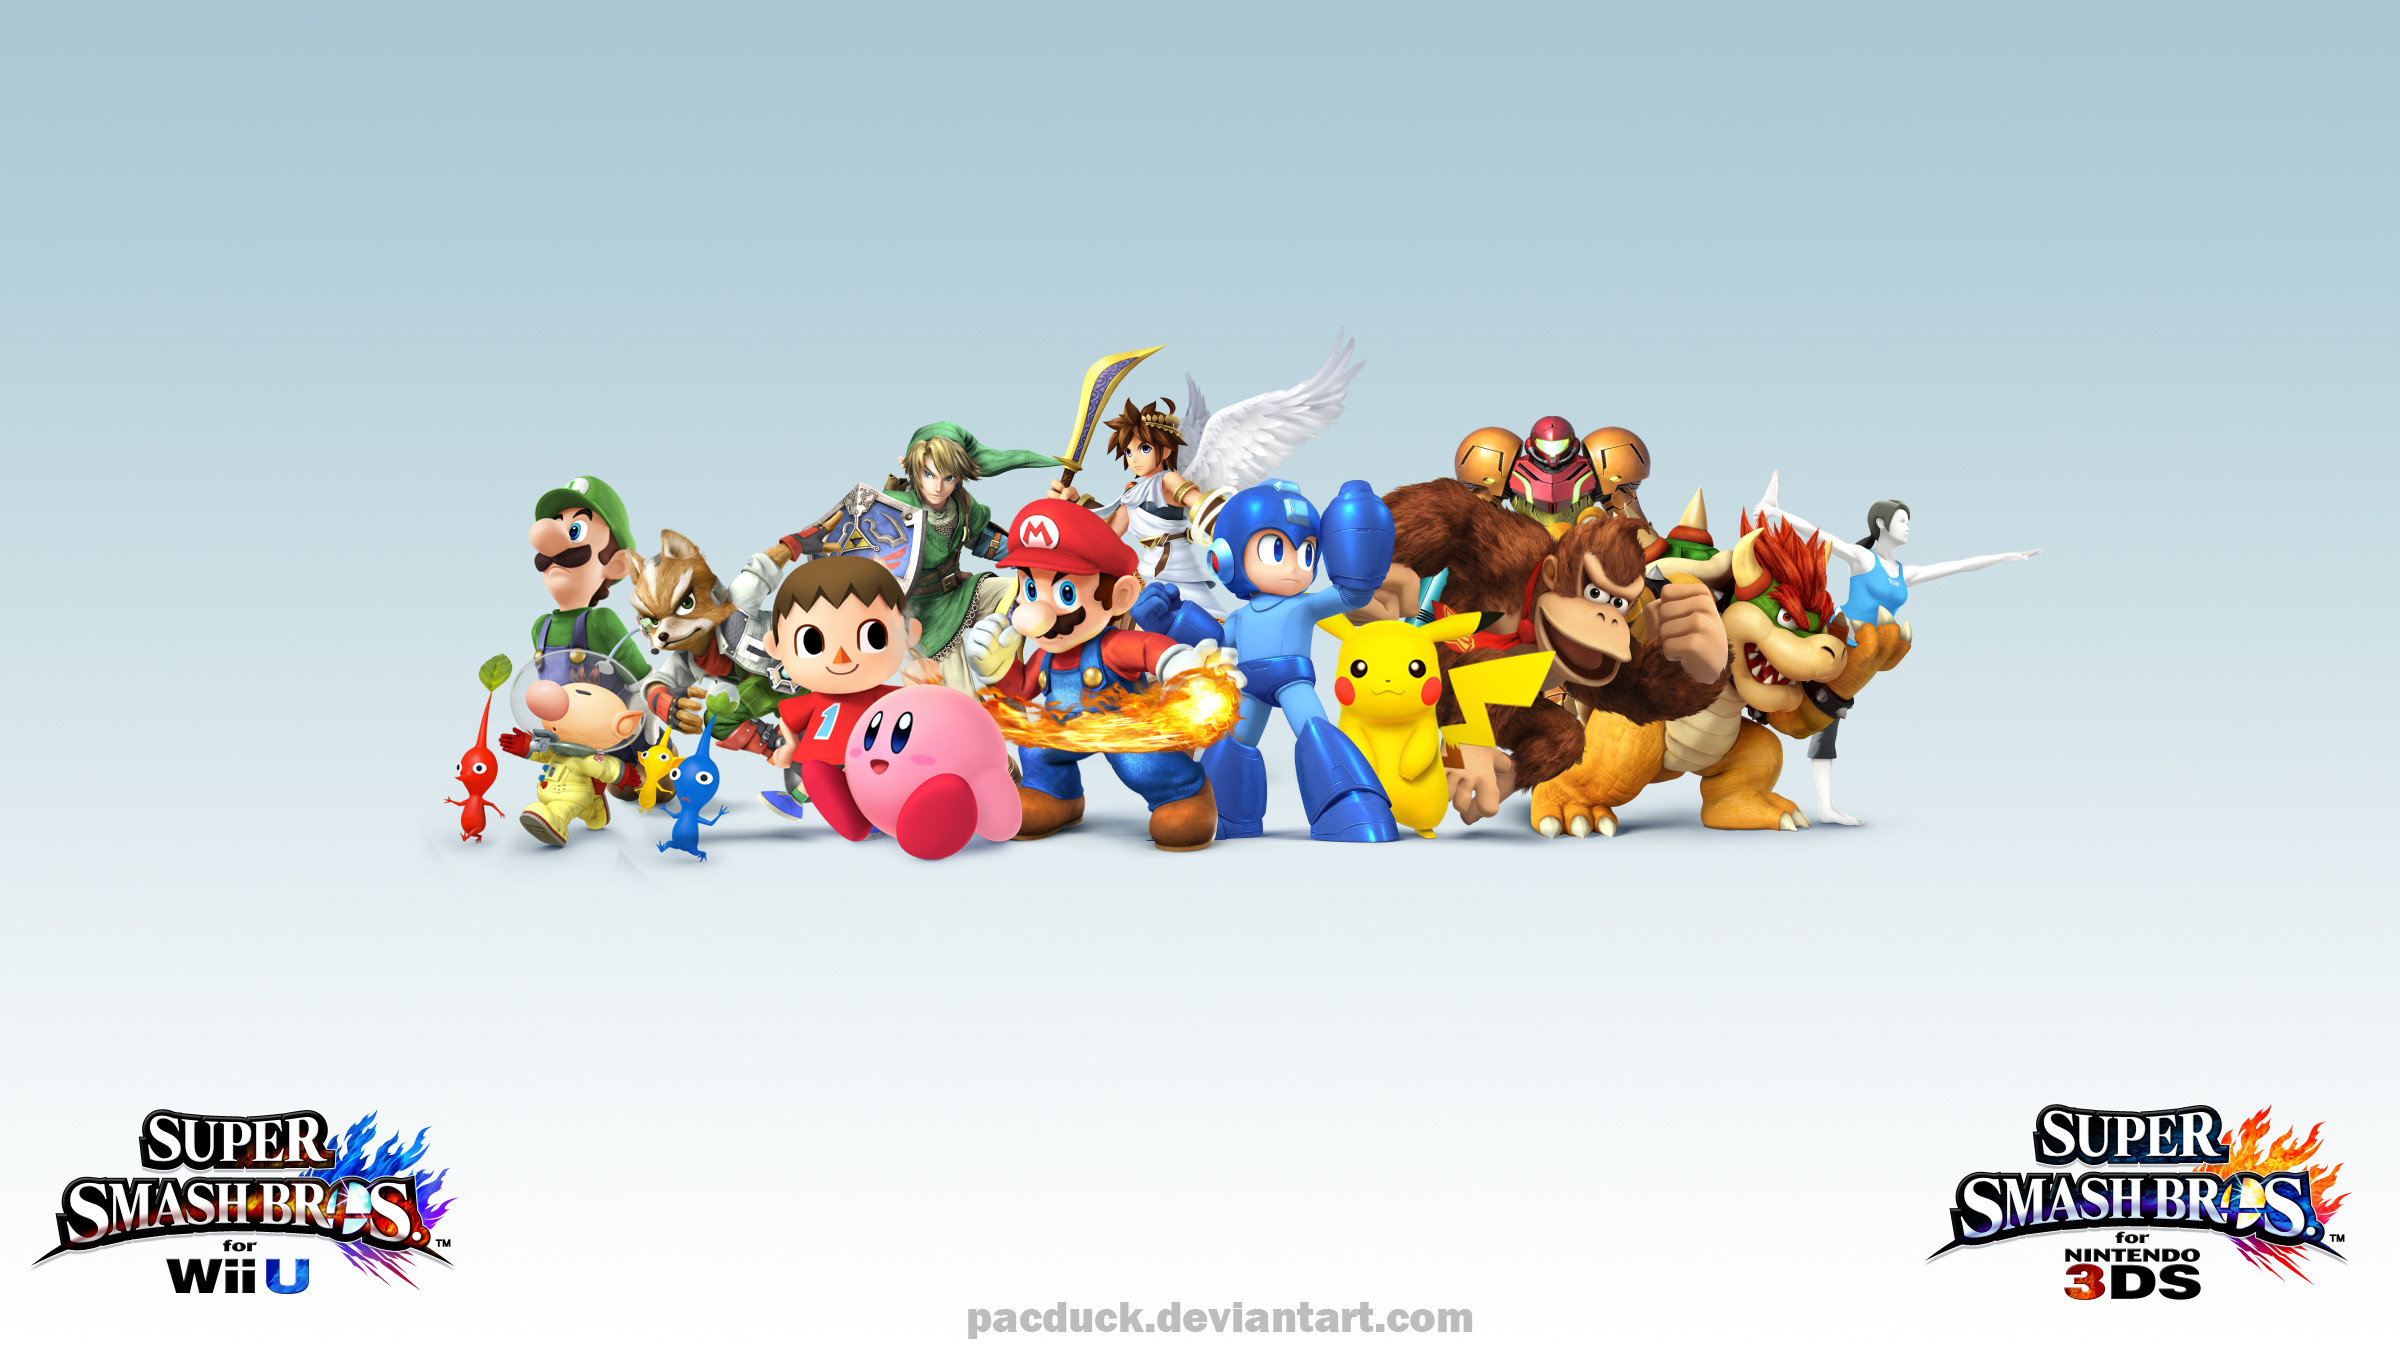 Need help choosing a Smash desktop wallpaper. – Super Smash Bros. for Wii U  Message Board for Wii U – Page 2 – GameFAQs